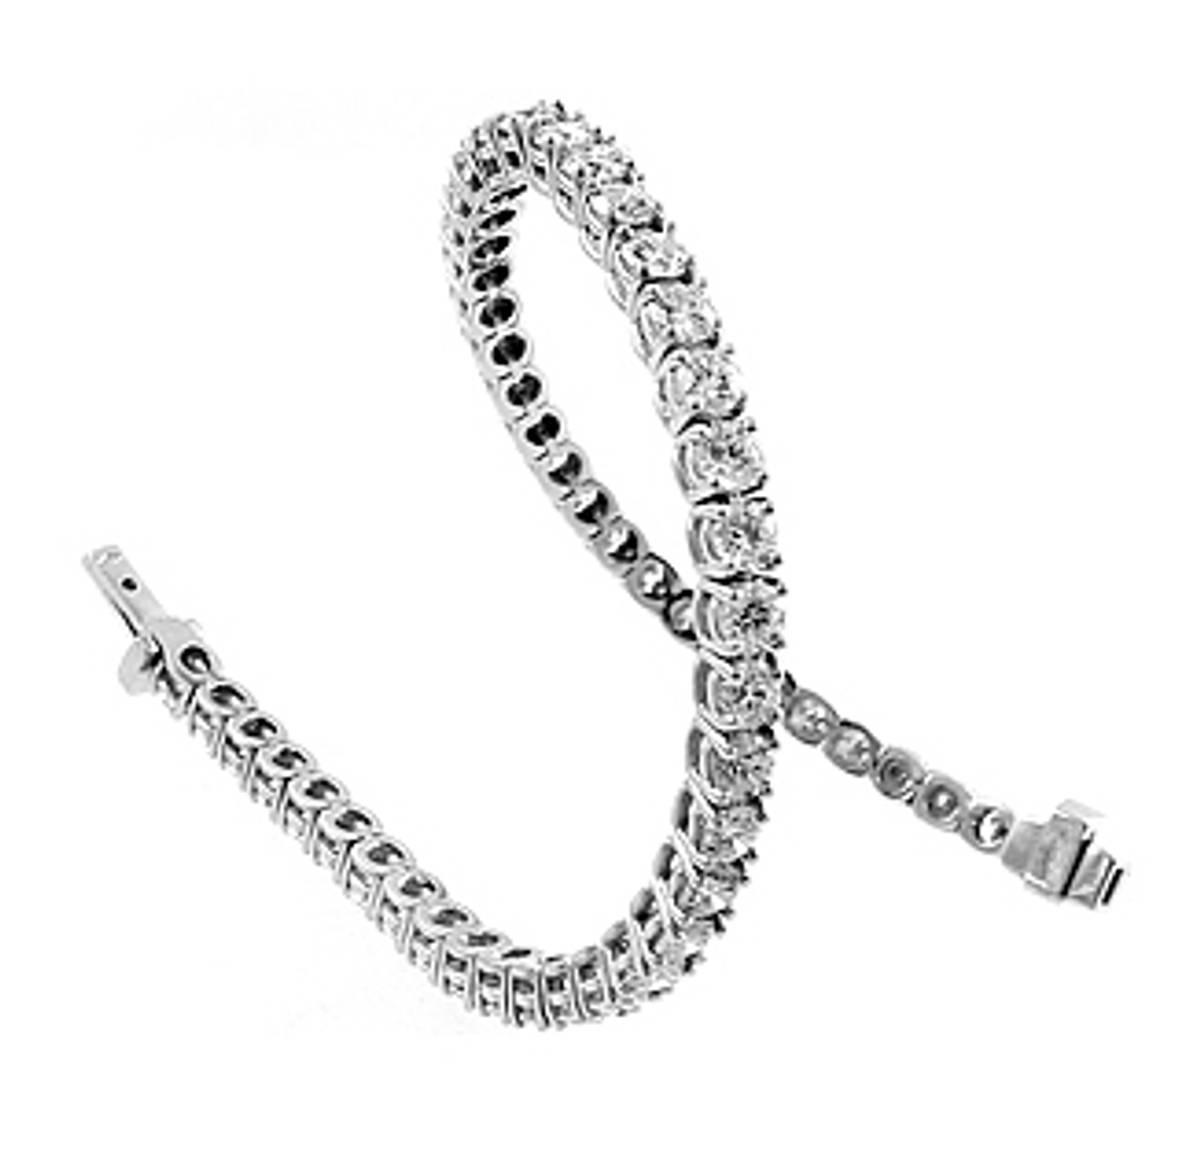 18k white gold brilliant cut diamond tennis bracelet Total diamond weight 6.03cts Made in Ireland